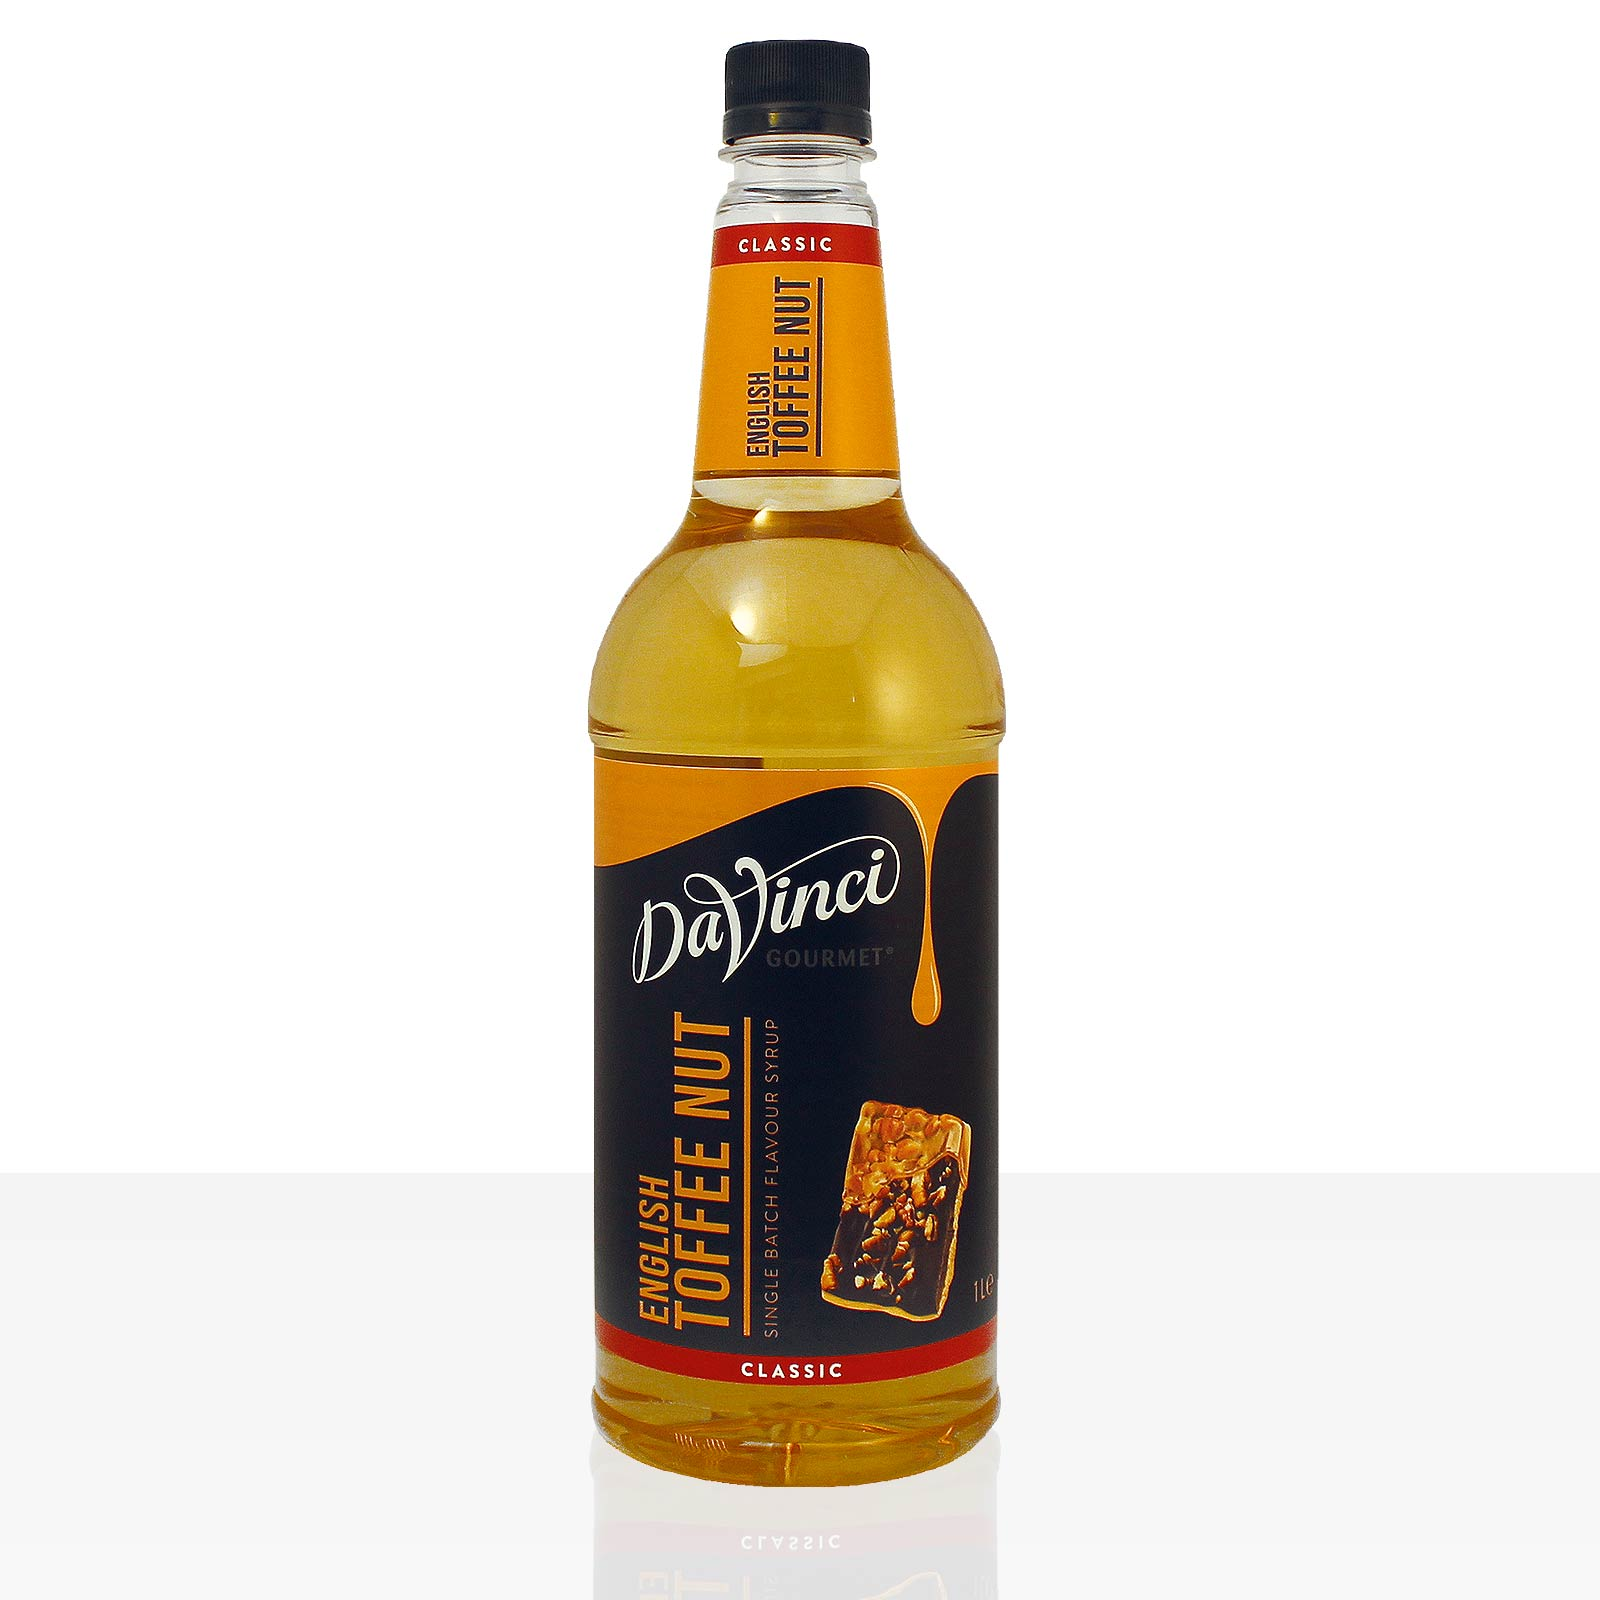 Da Vinci Gourmet Flavour Sirup English Toffee Nut 1000ml Kaffeesirup